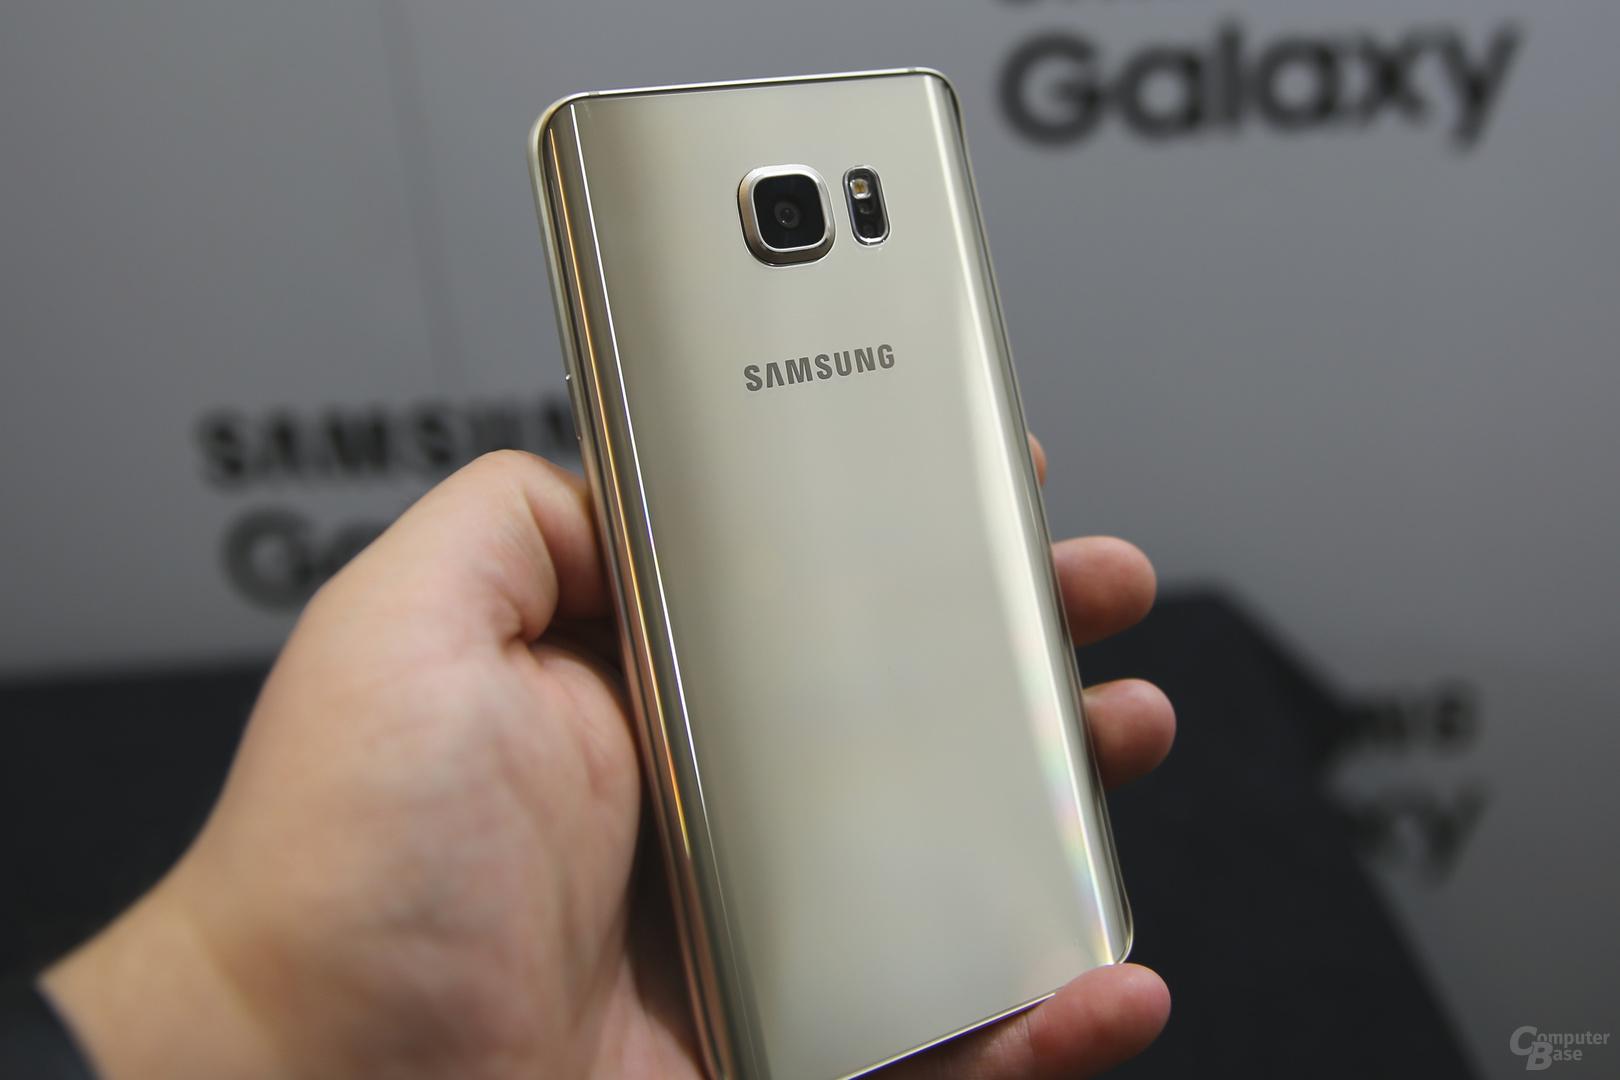 Das Galaxy Note 5 folgt dem Design des Galaxy S6